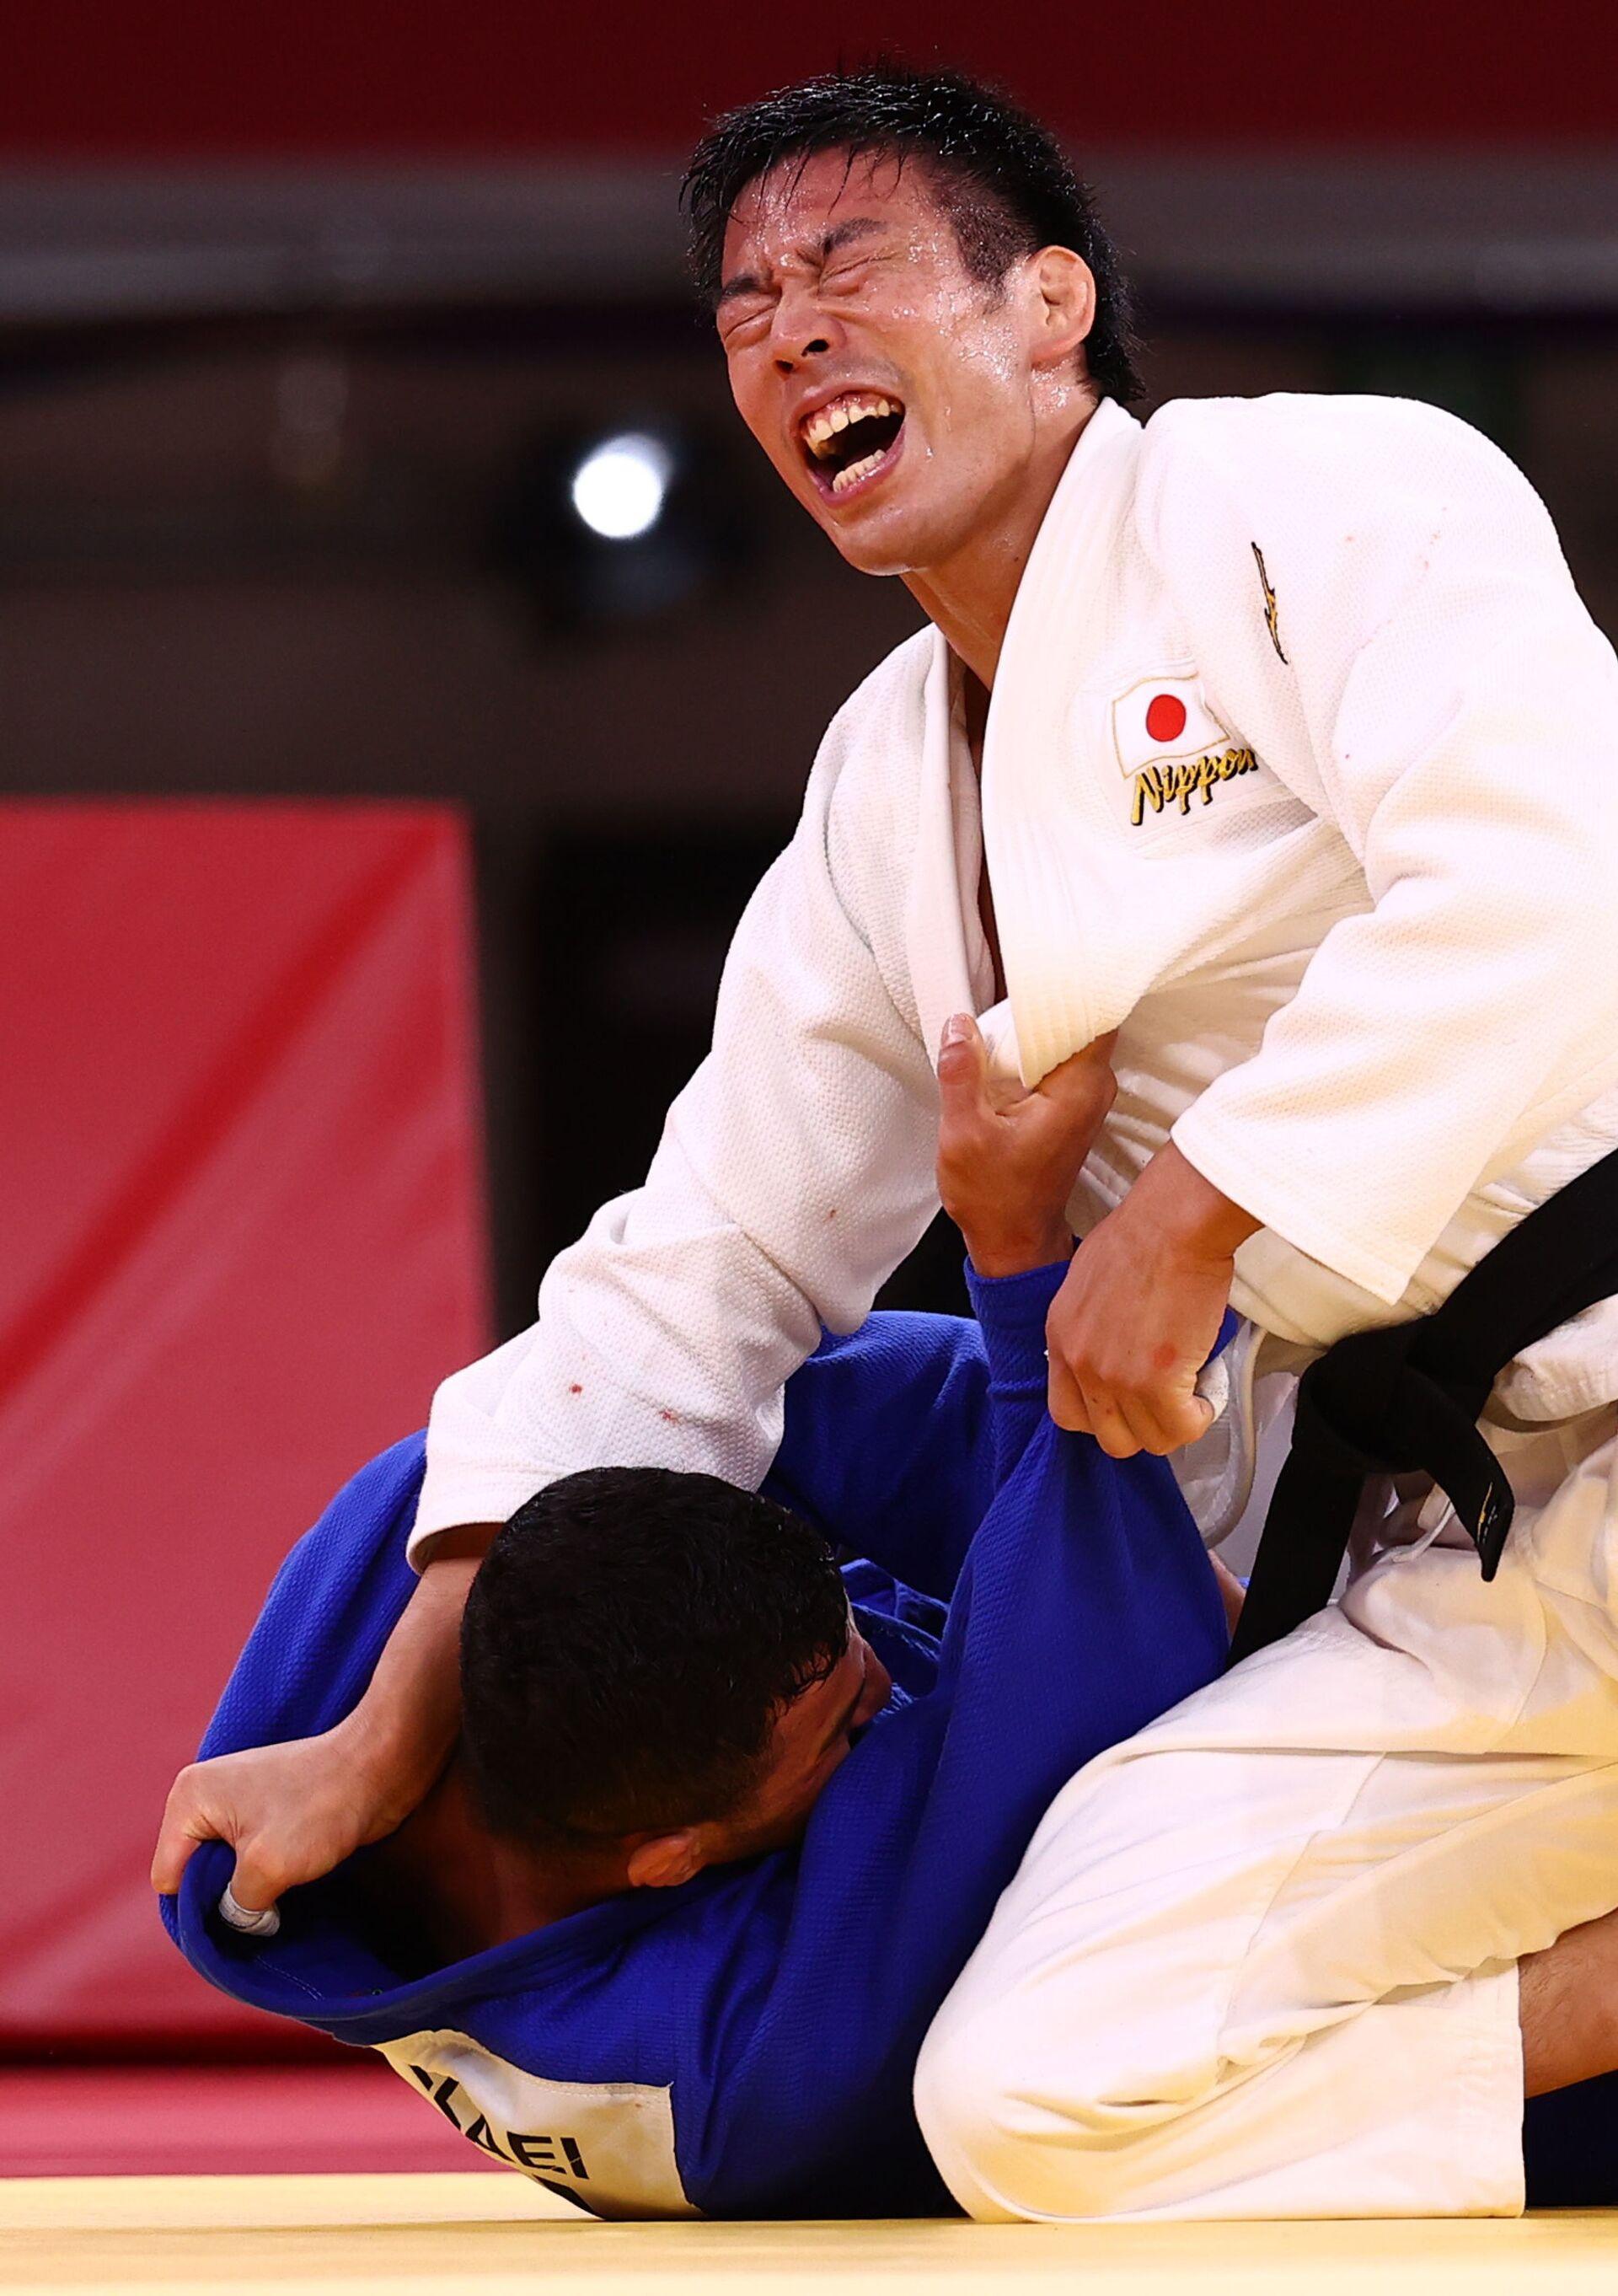 Takanori Nagase of Japan reacts after winning gold against Saeid Mollaei of Mongolia - Sputnik International, 1920, 07.09.2021